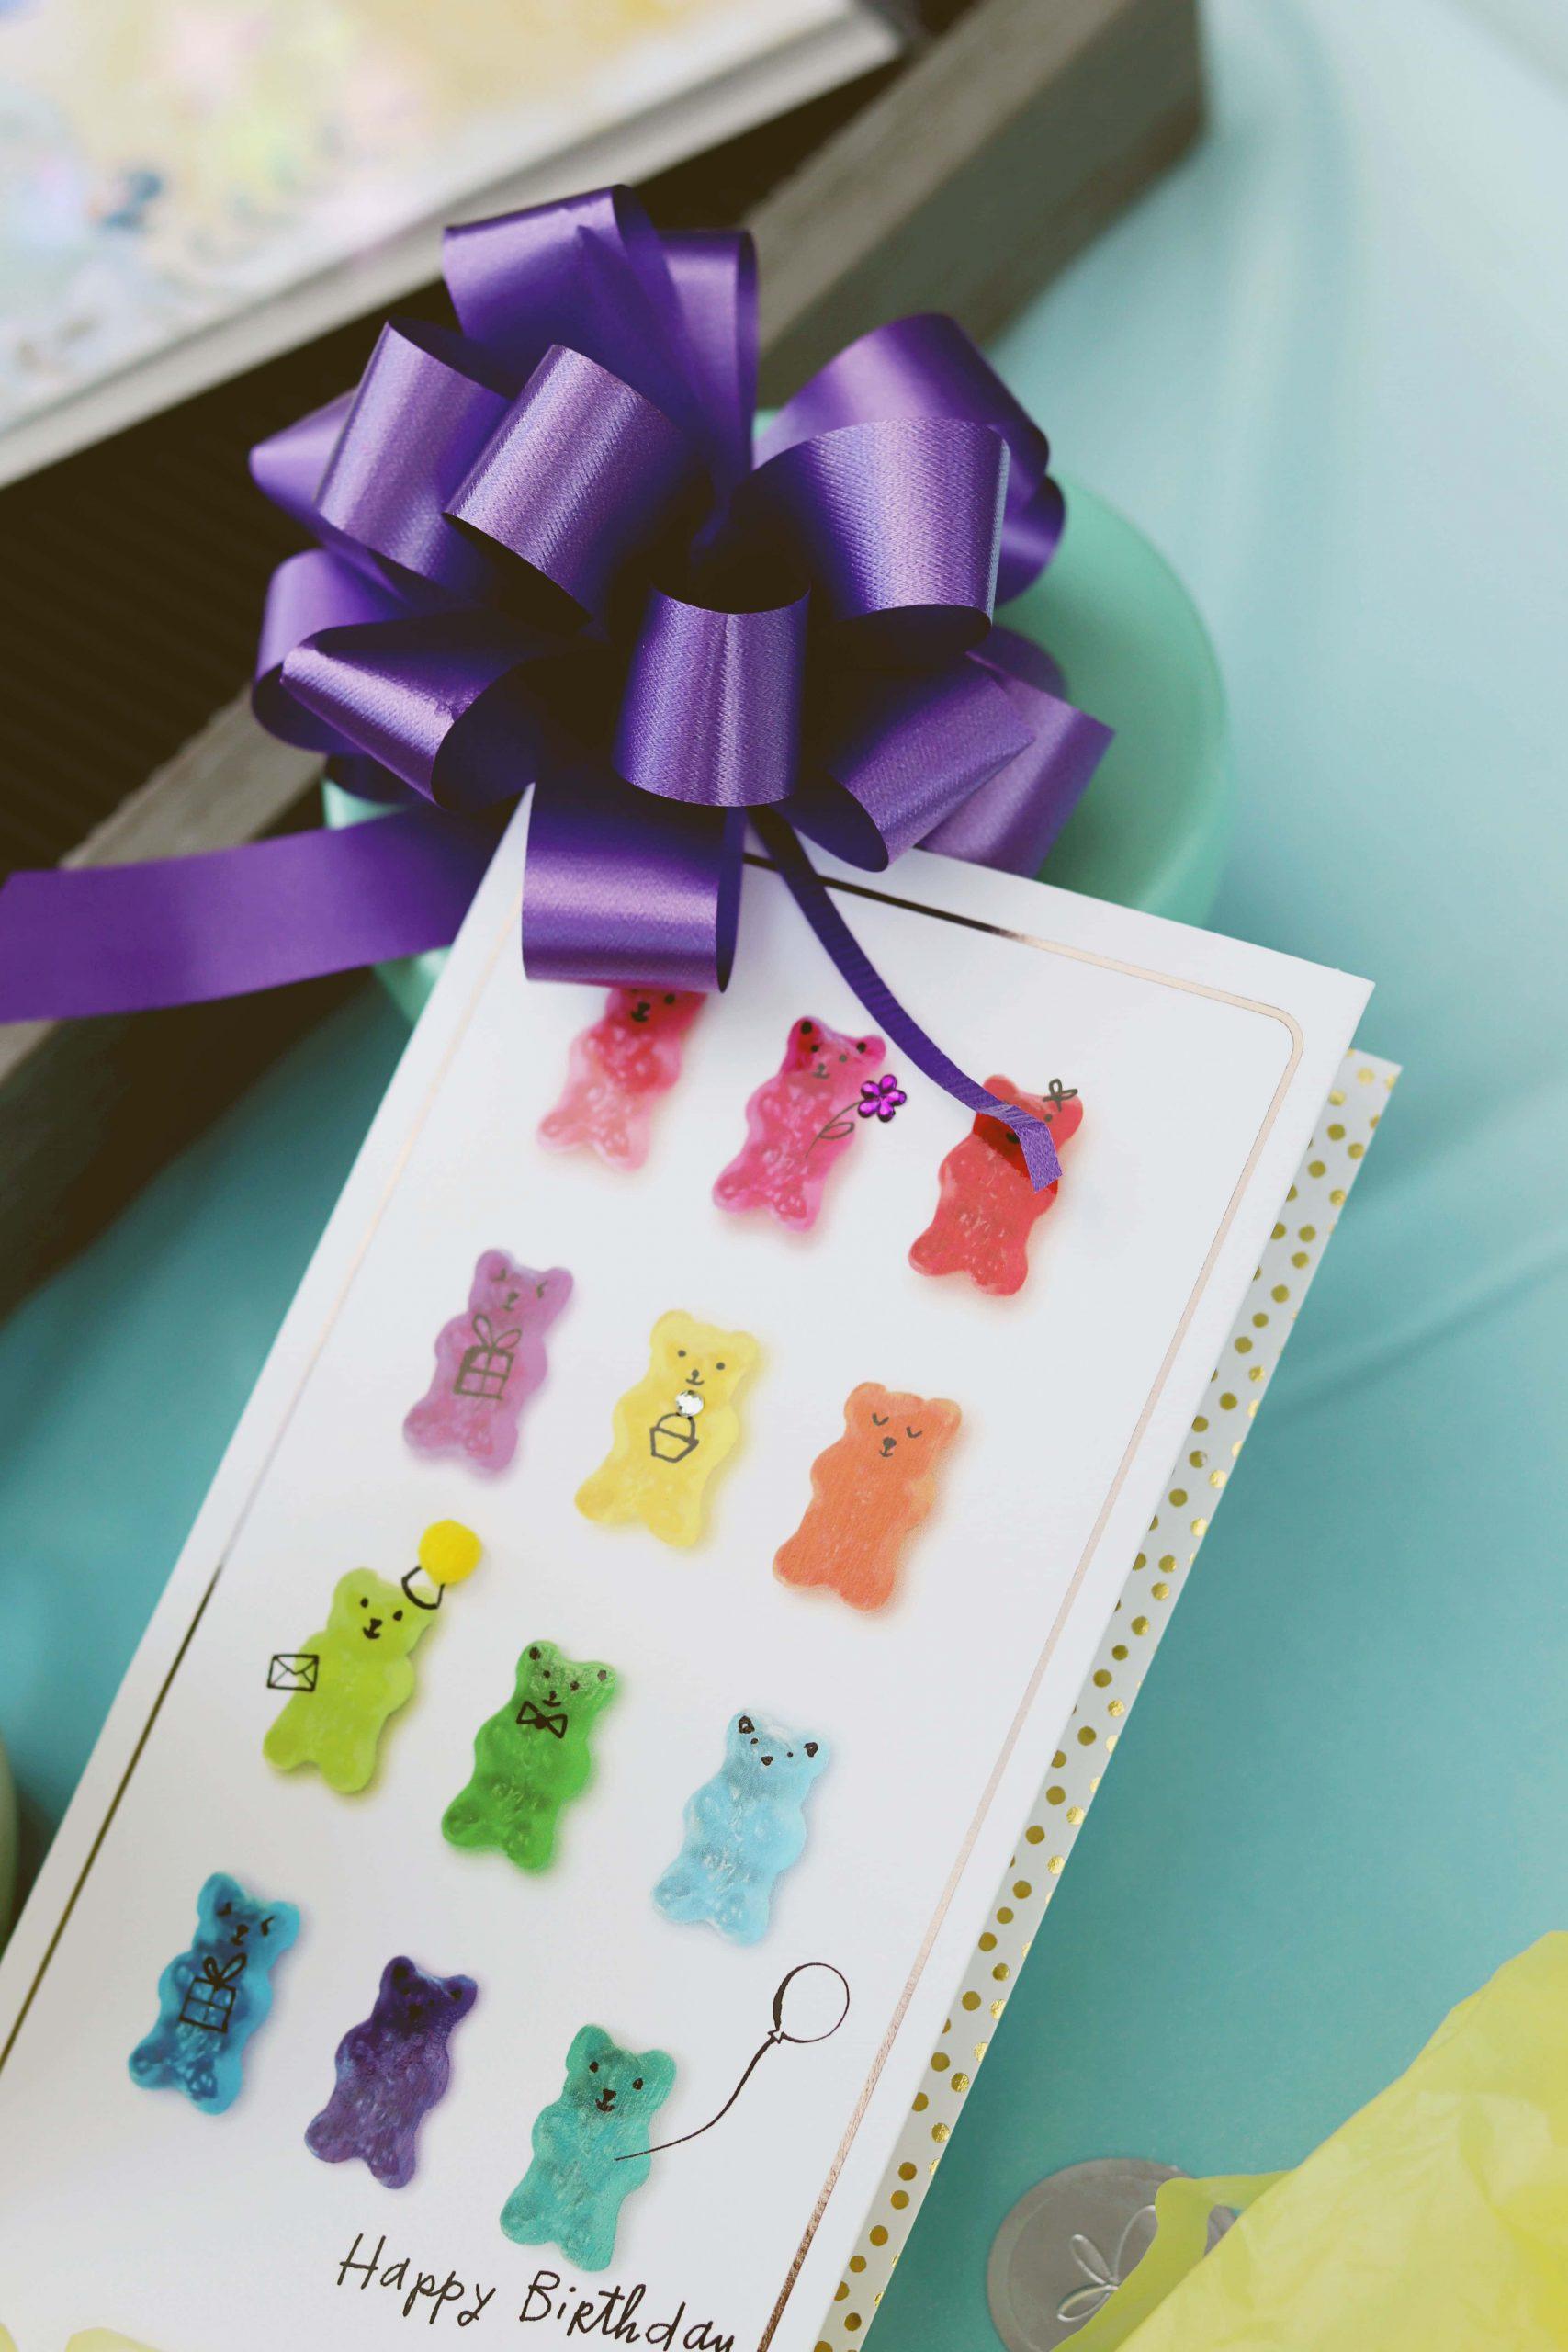 Printable Birthday Calendar: Celebrate Birthdays With Paper Thread by American Greetings